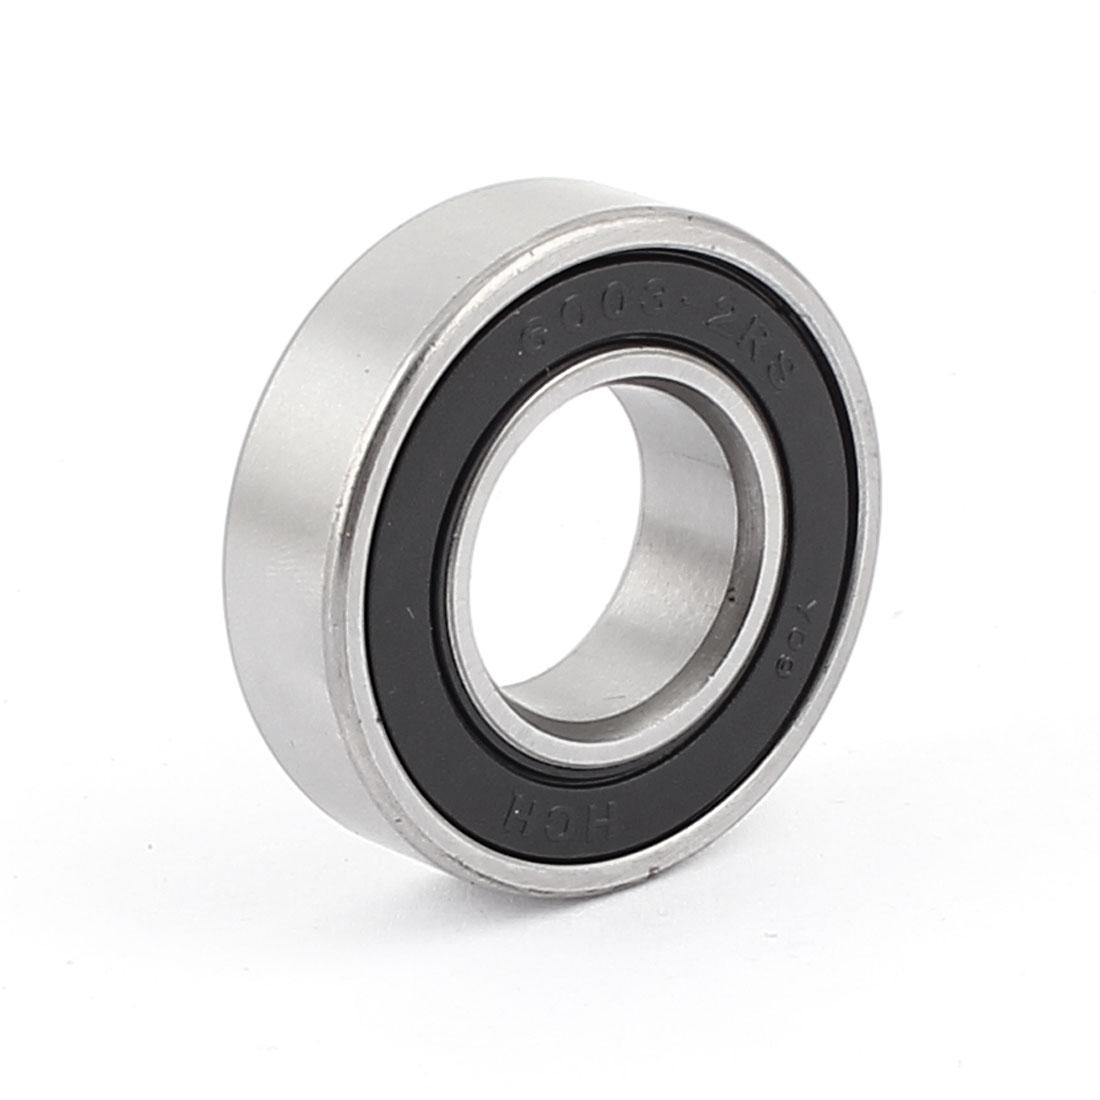 6003-2RS Shielded Deep Groove Ball Wheel Bearing 35mm x 17mm x 10mm